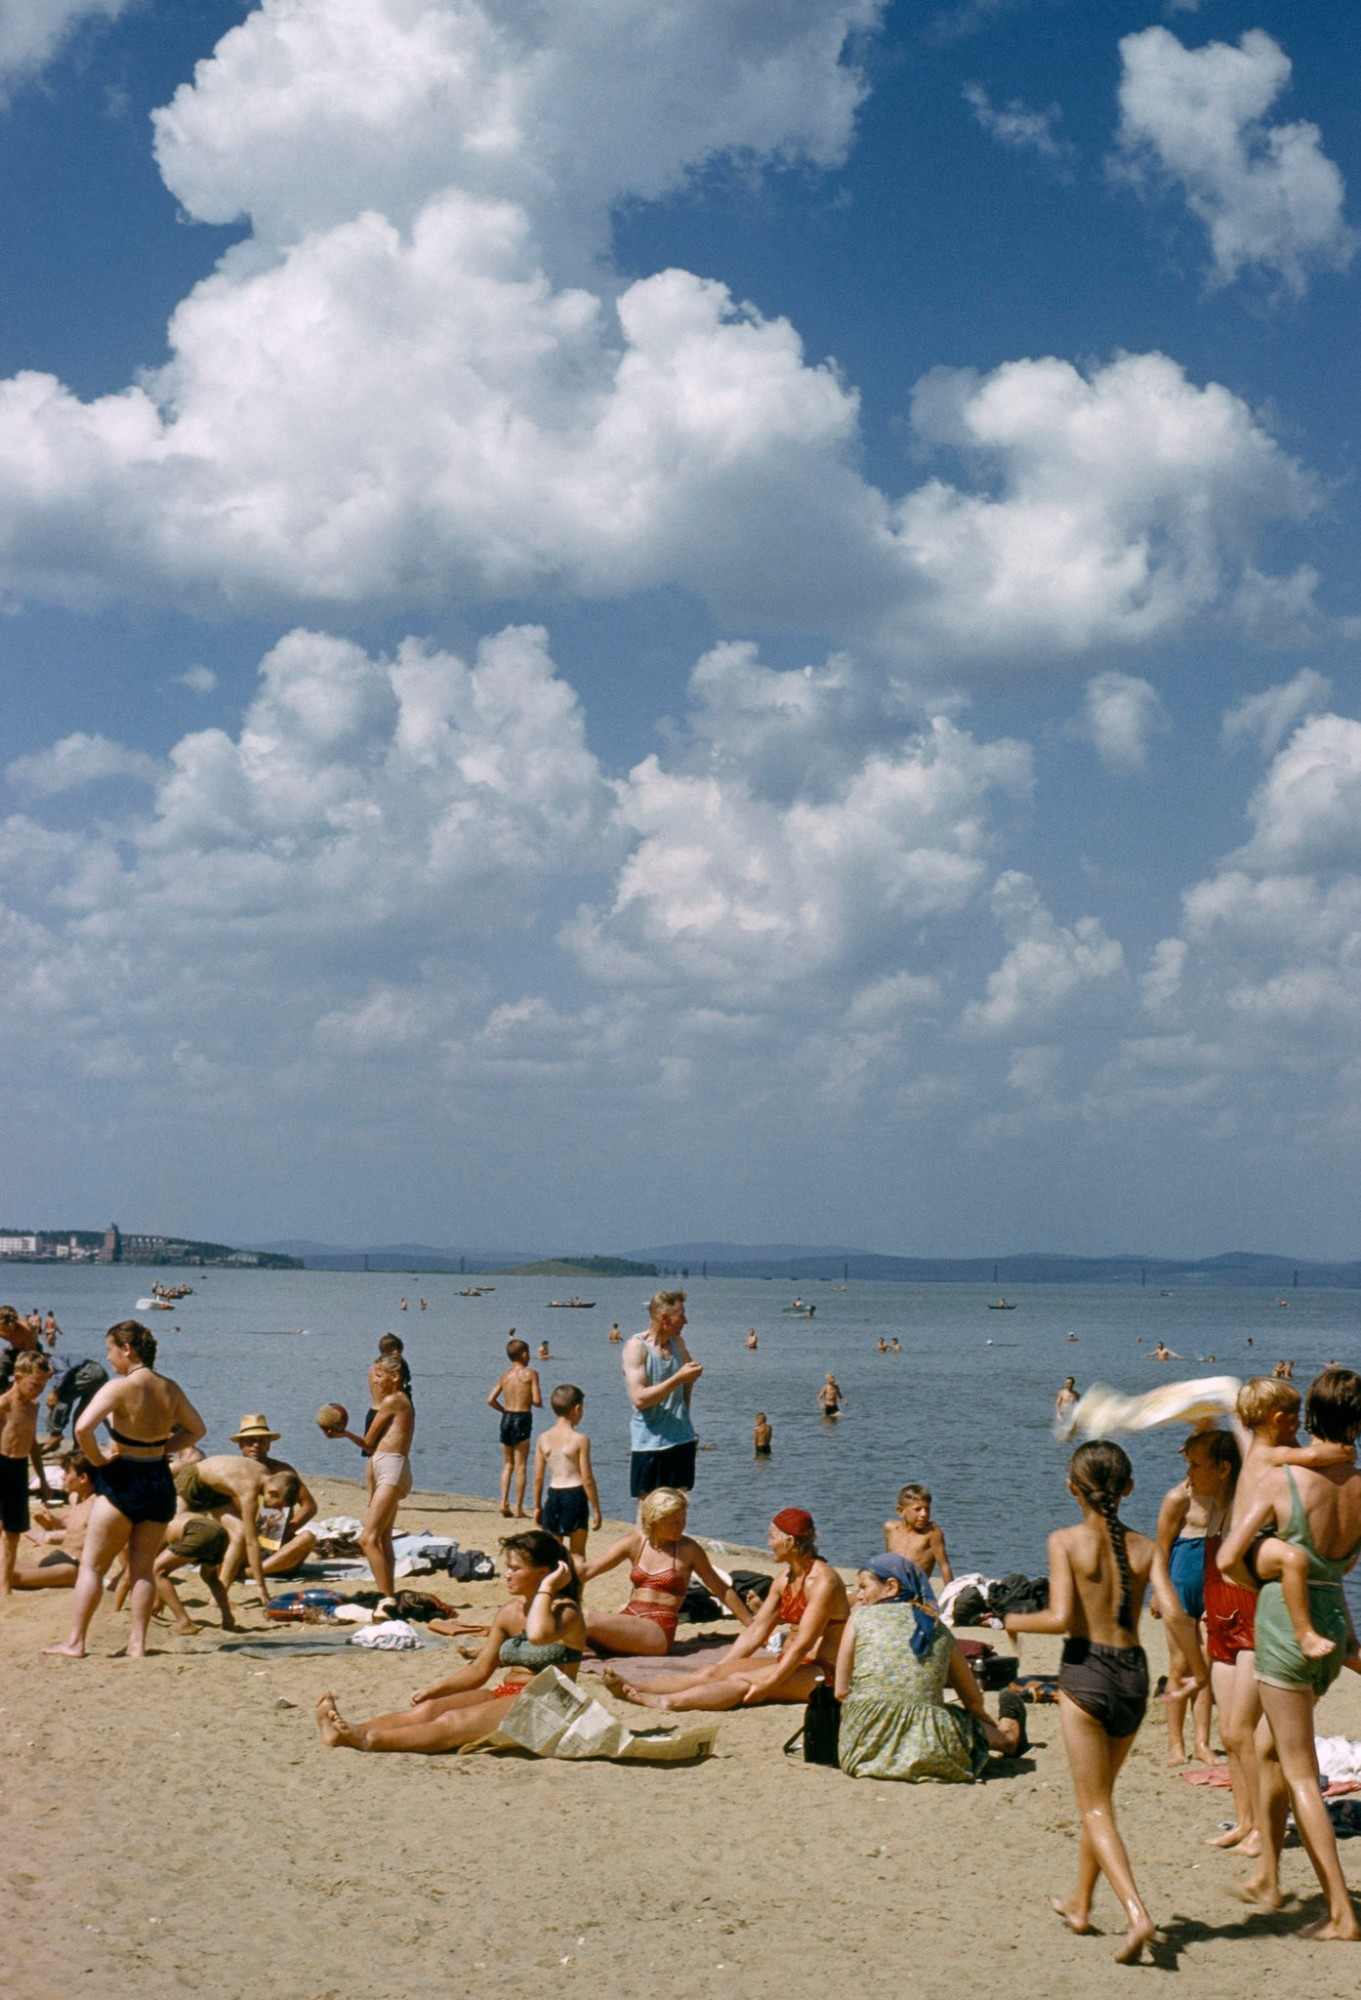 1959 Свердловск. Пляж на Исети. B. Anthony Stewart